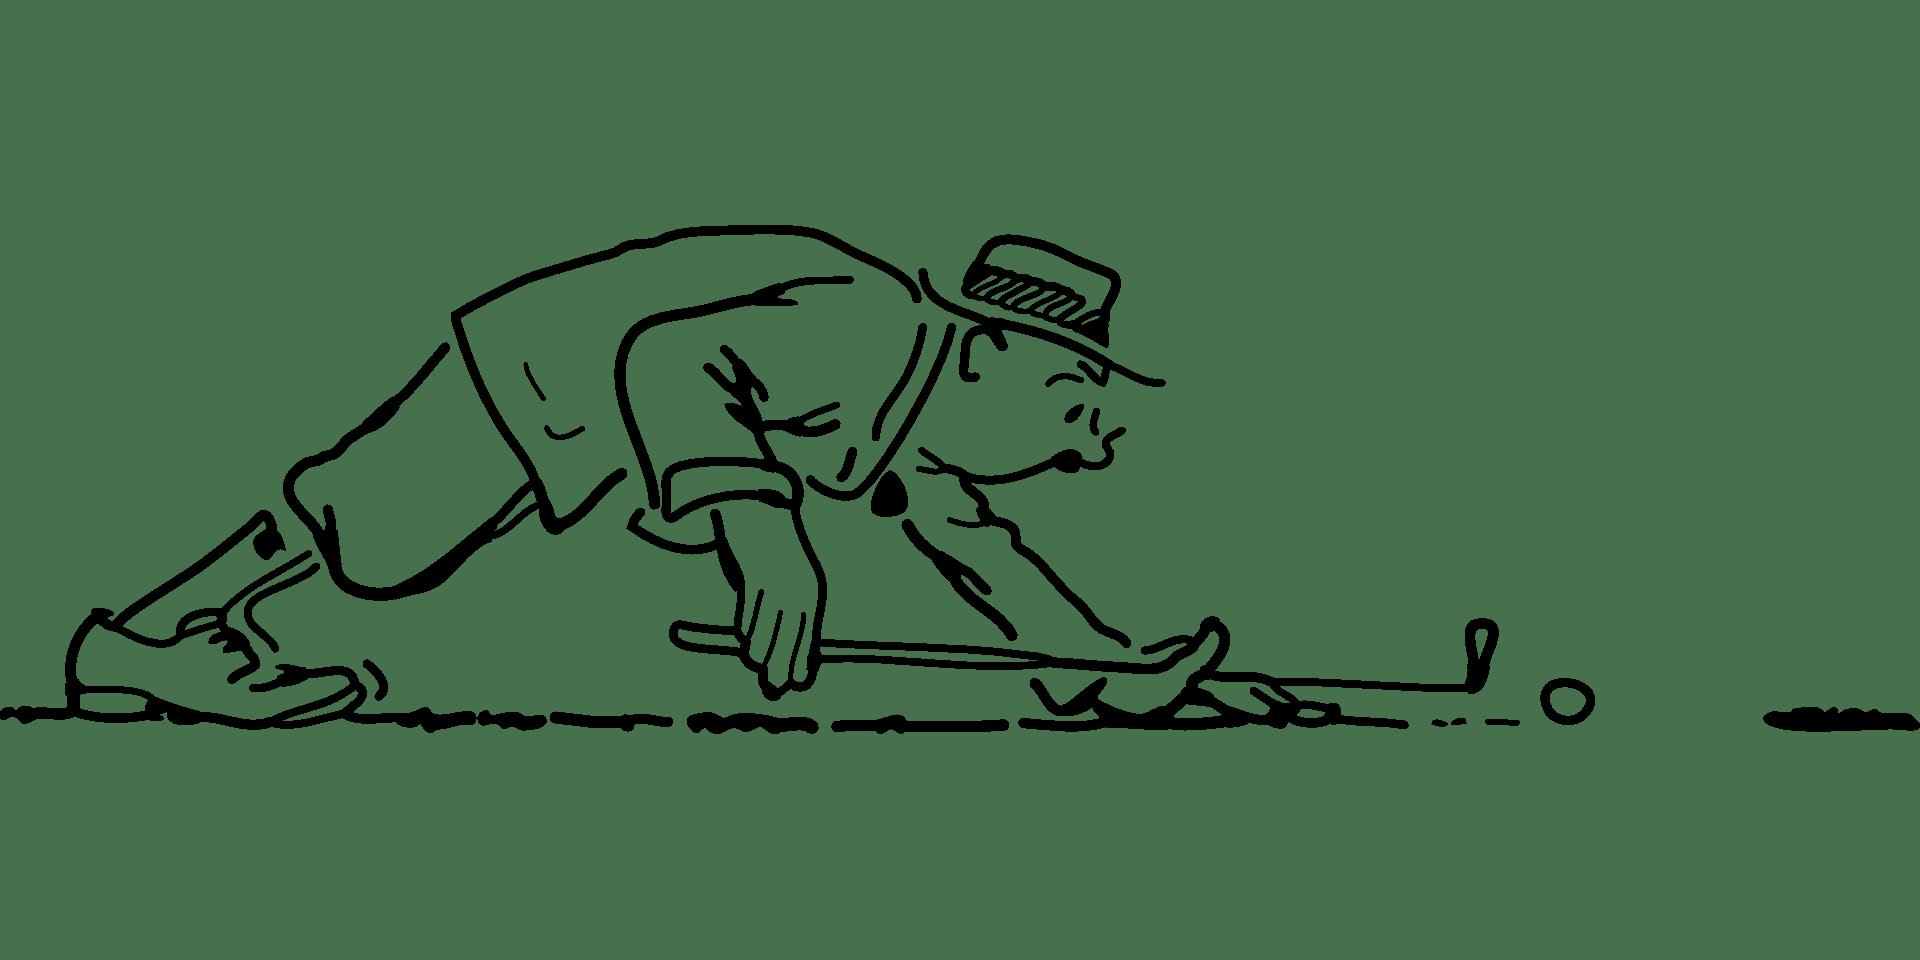 Toerisme Ariège Sport Golf Illustratie